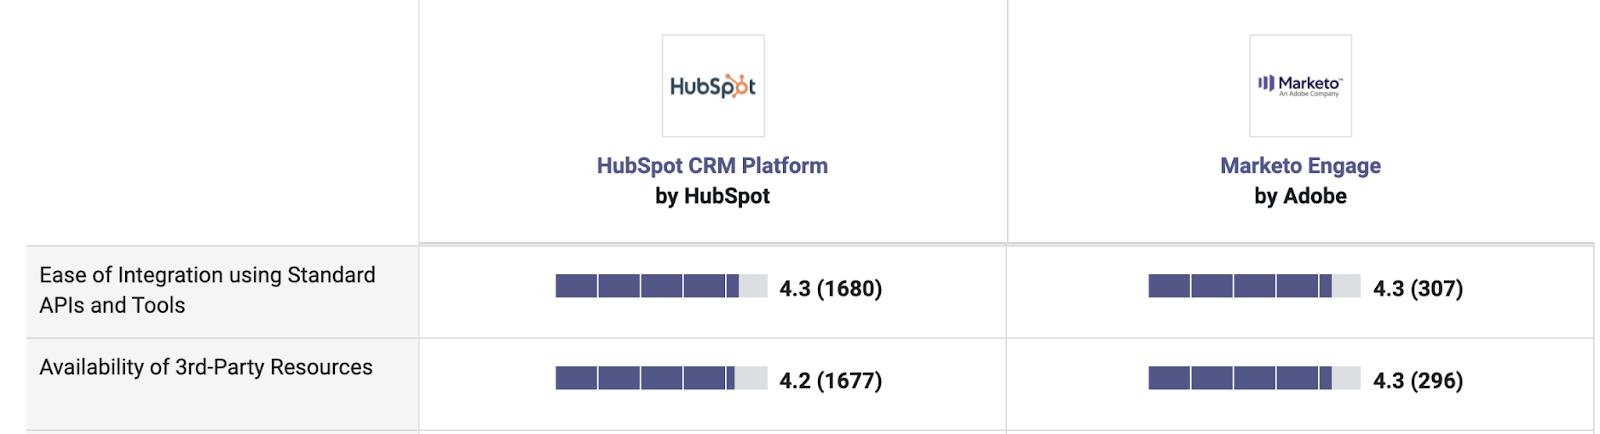 Hubspot vs Marketo ease of integration comparison